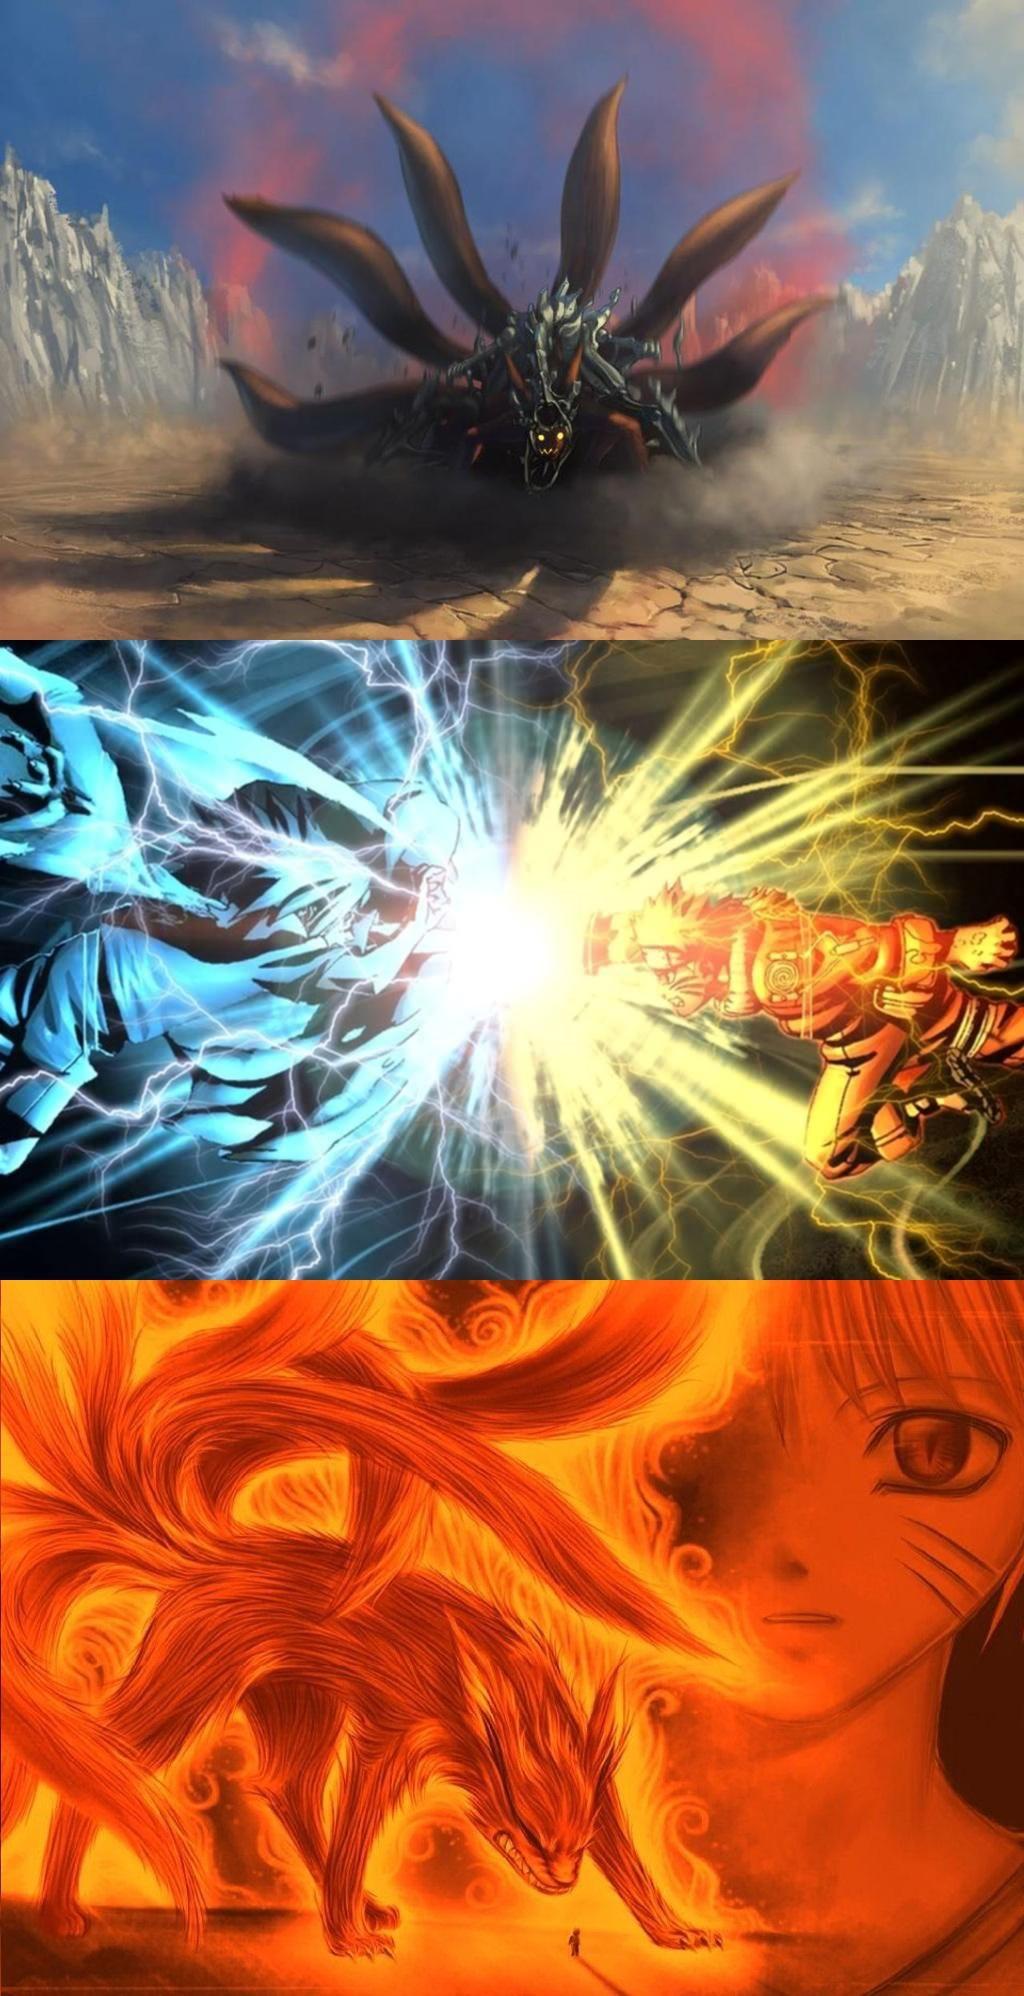 Games Naruto Bertarung : games, naruto, bertarung, Naruto, Nine-tailed, Naruto,, Anime